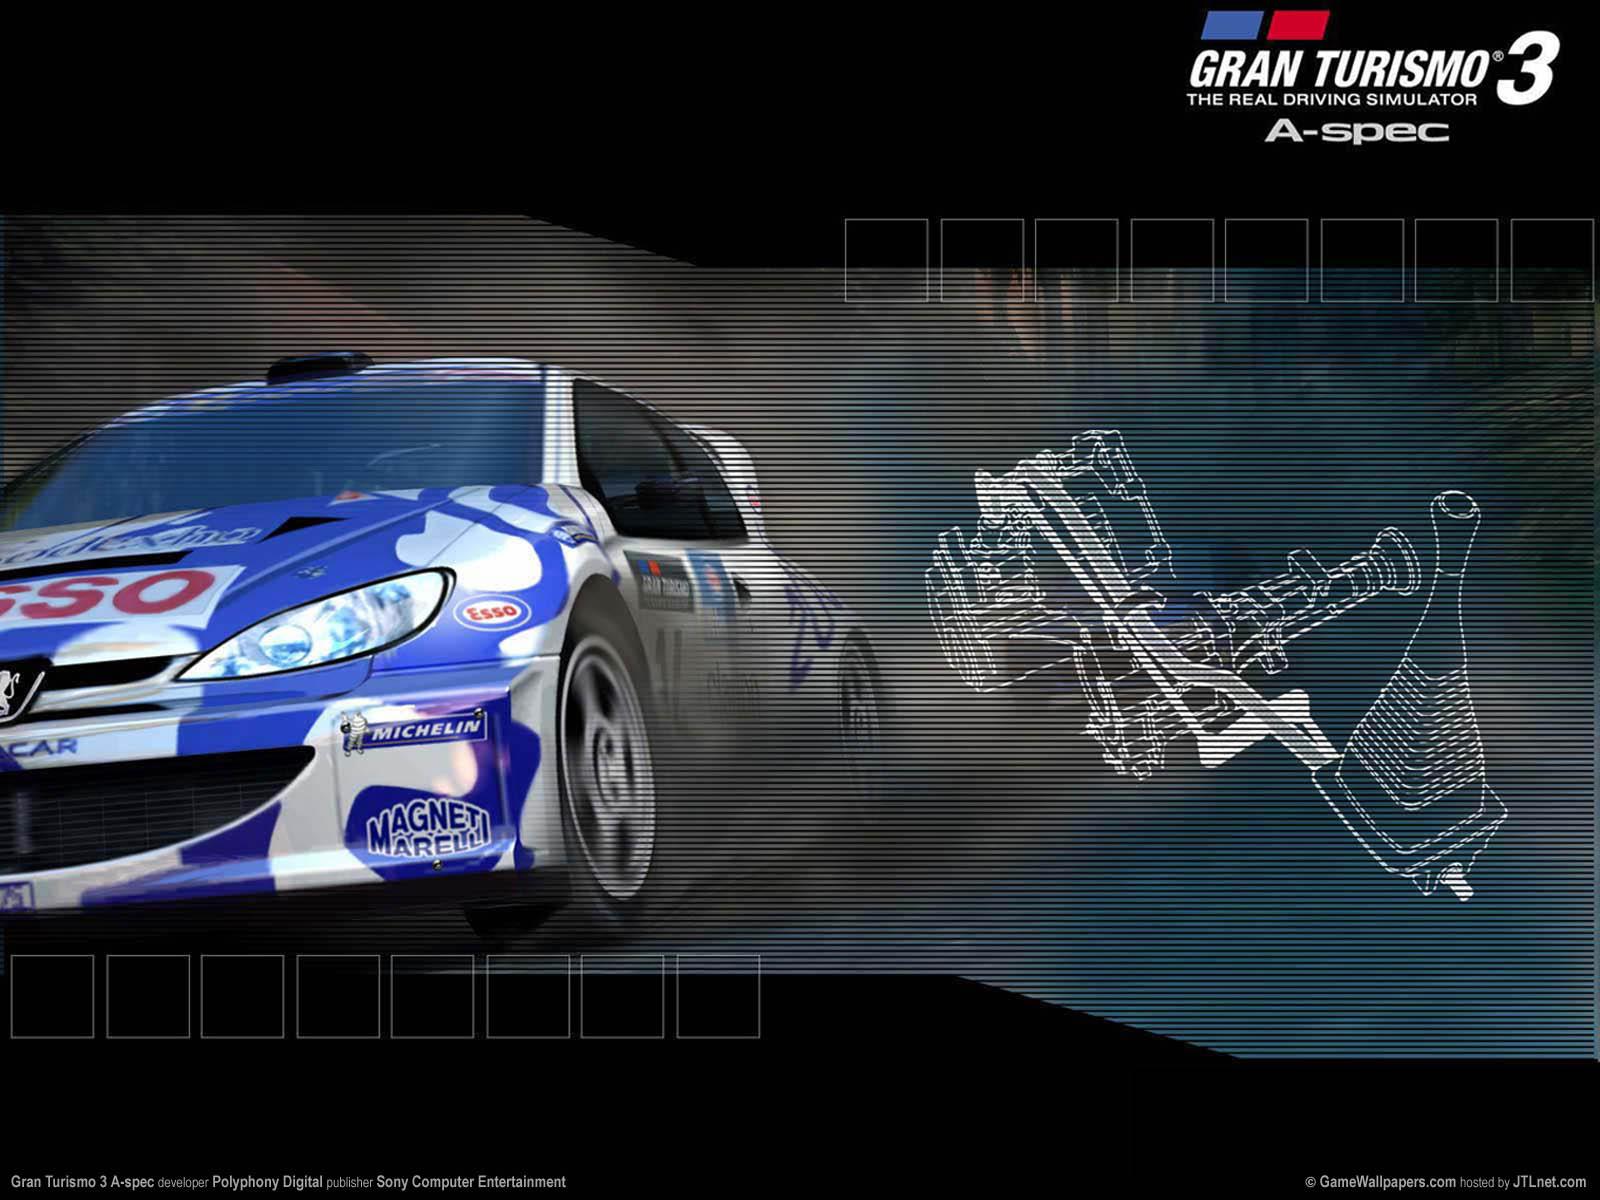 Gran Turismo 3 A-spec Hintergrundbild 05 1600x1200